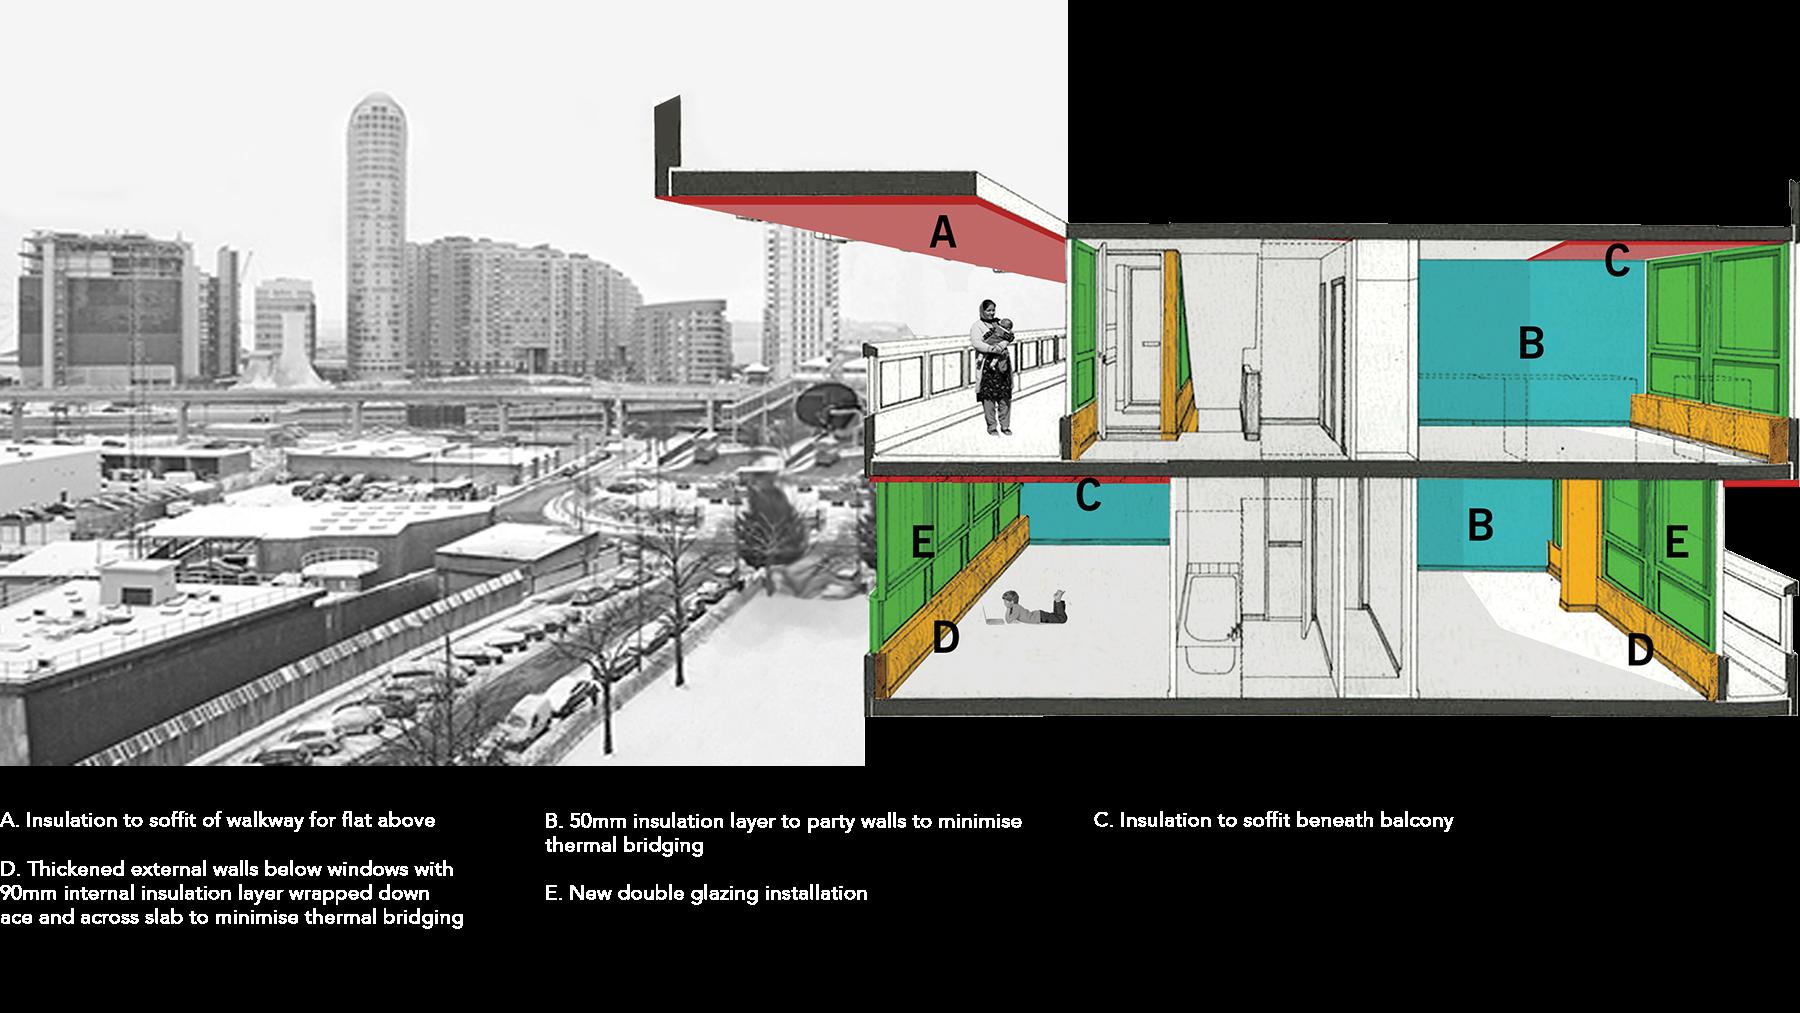 Sarah-Wigglesworth-Architects Robin-Hood-Gardens-Retrospective Resource-Sustainability 1800